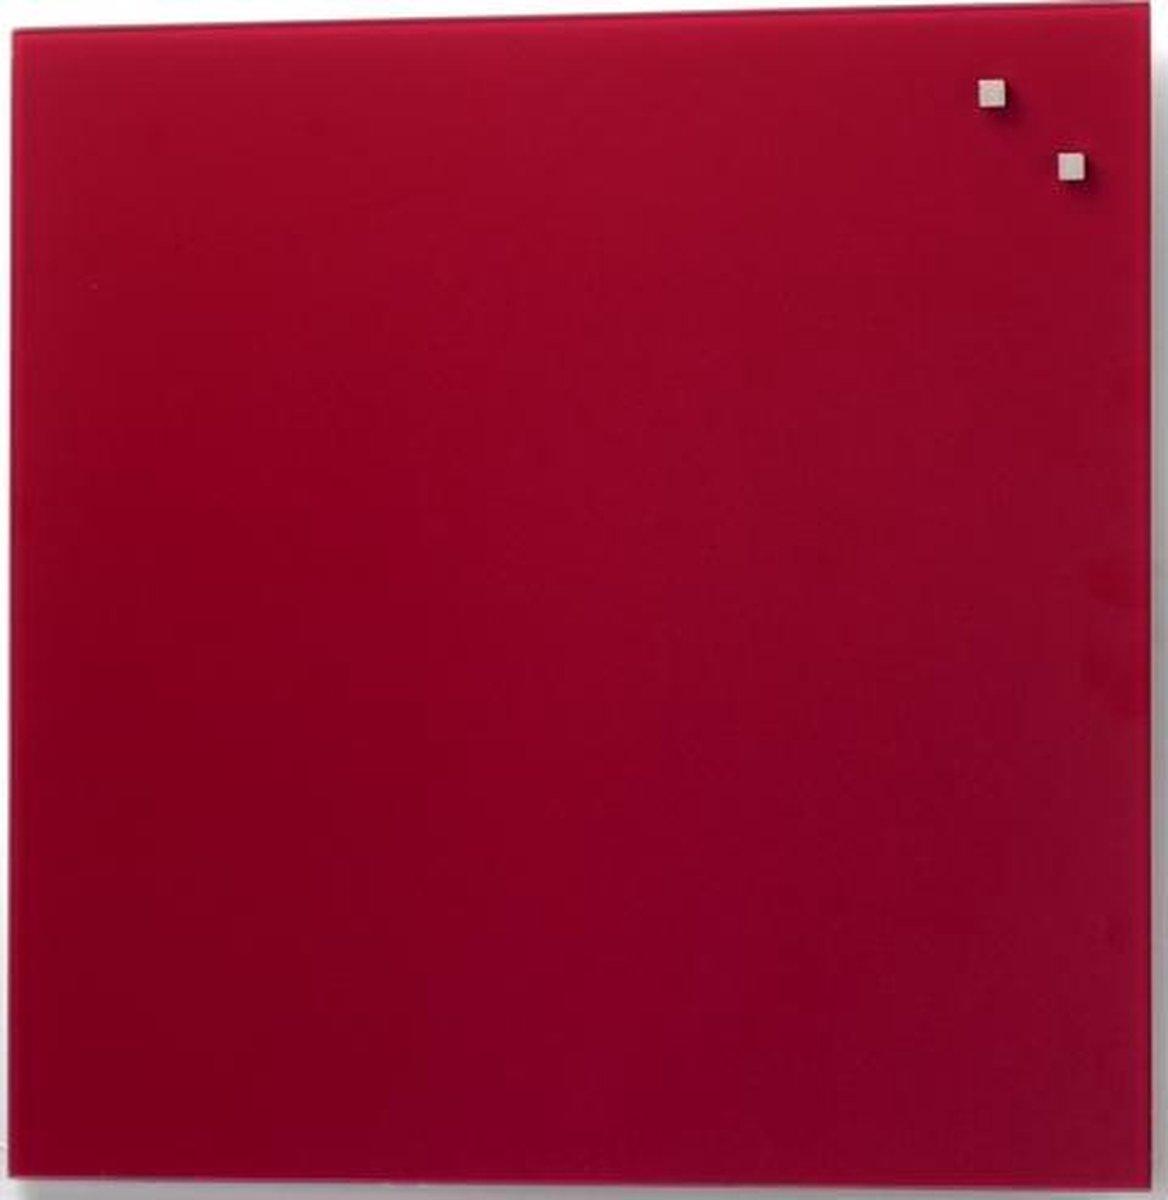 NAGA Glassboard 100x100cm Rood